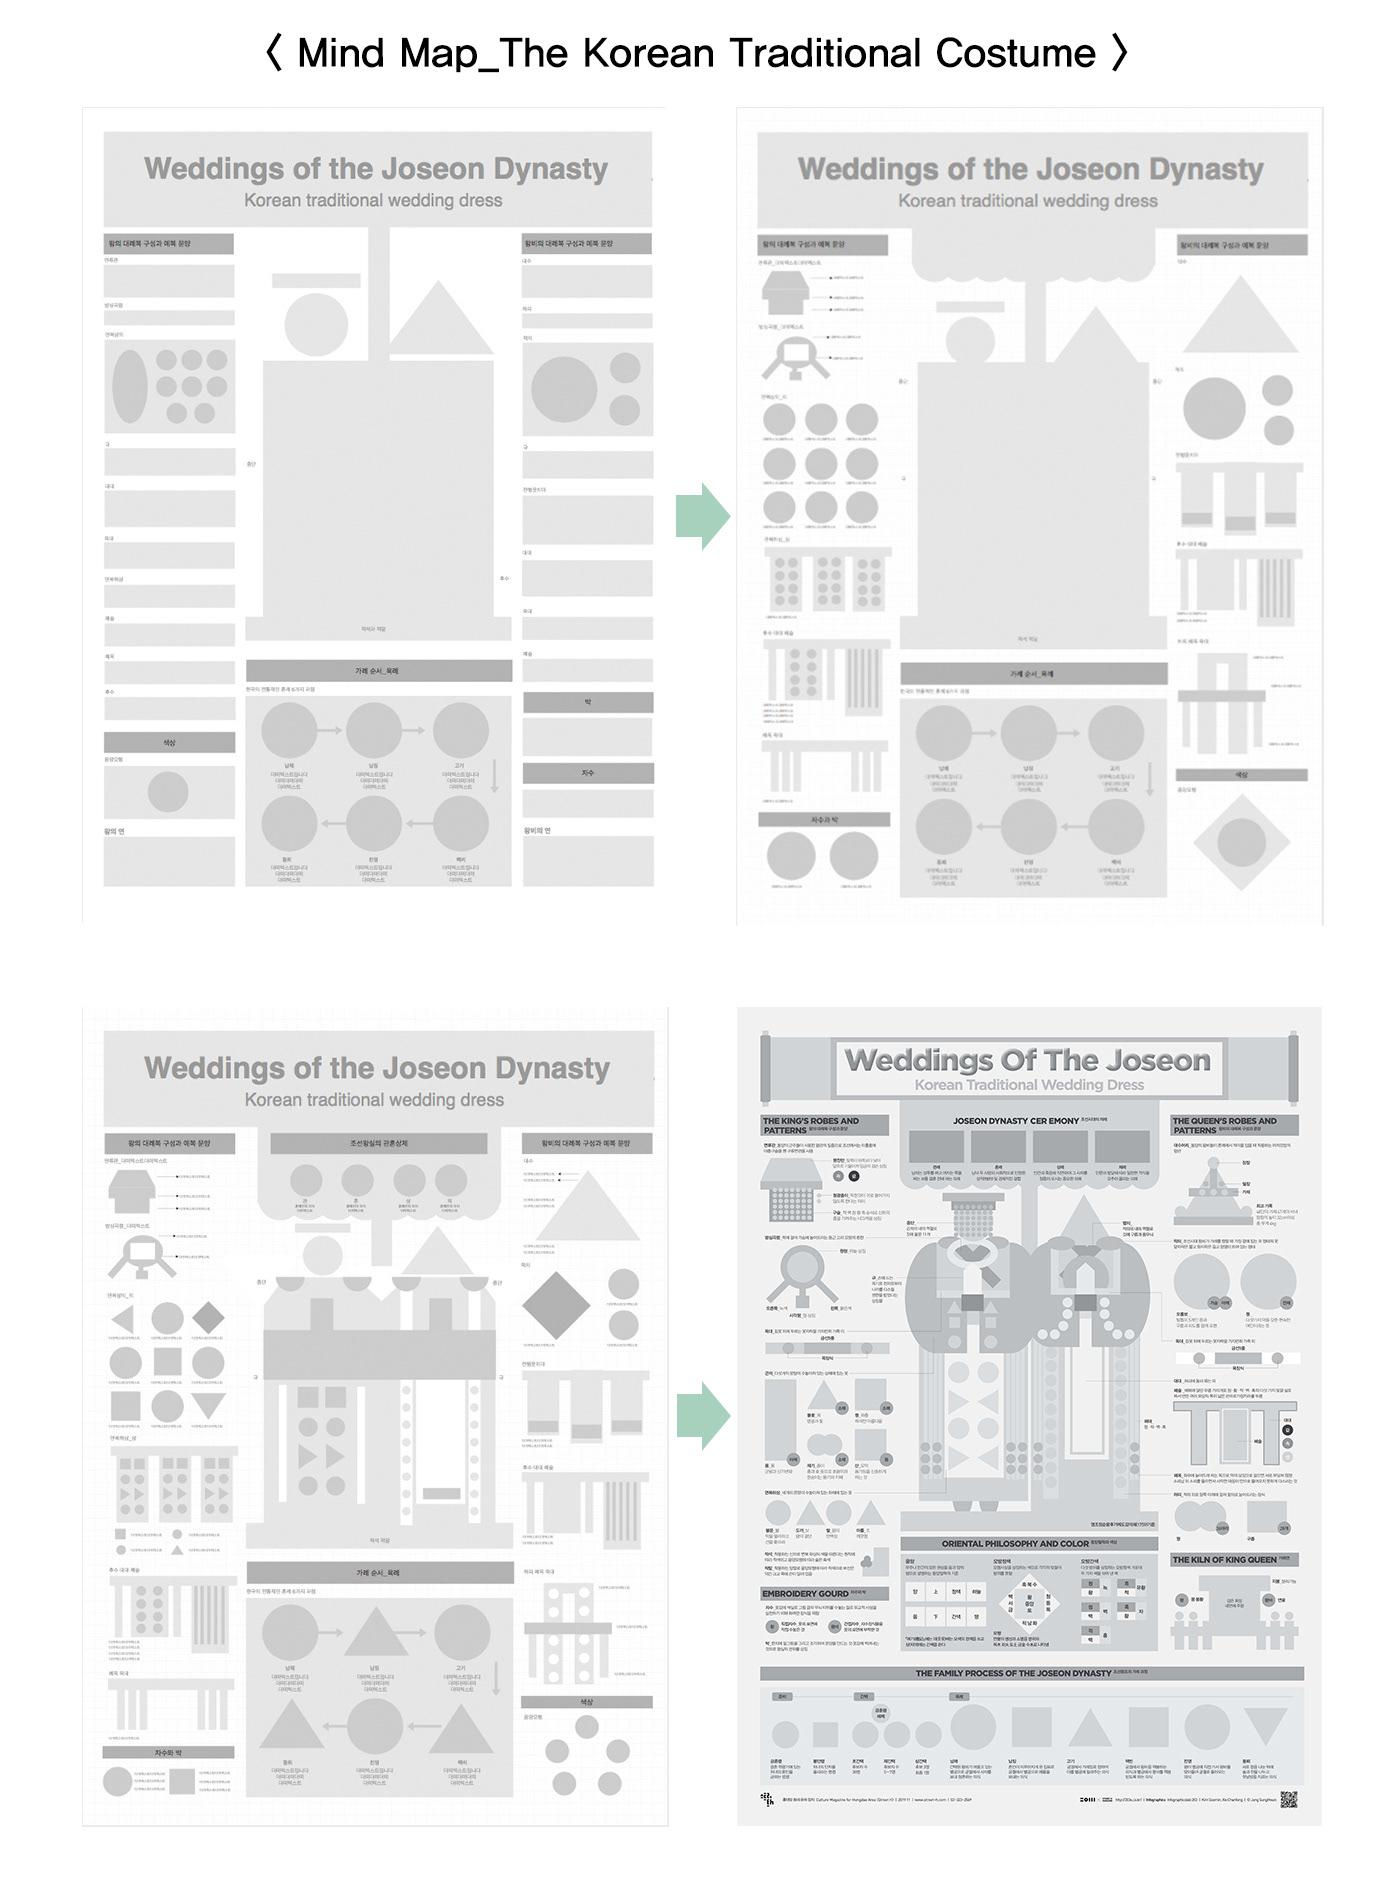 #203x costume dataviualization design editorial design  graphic infographic poster streeth the korean traditional